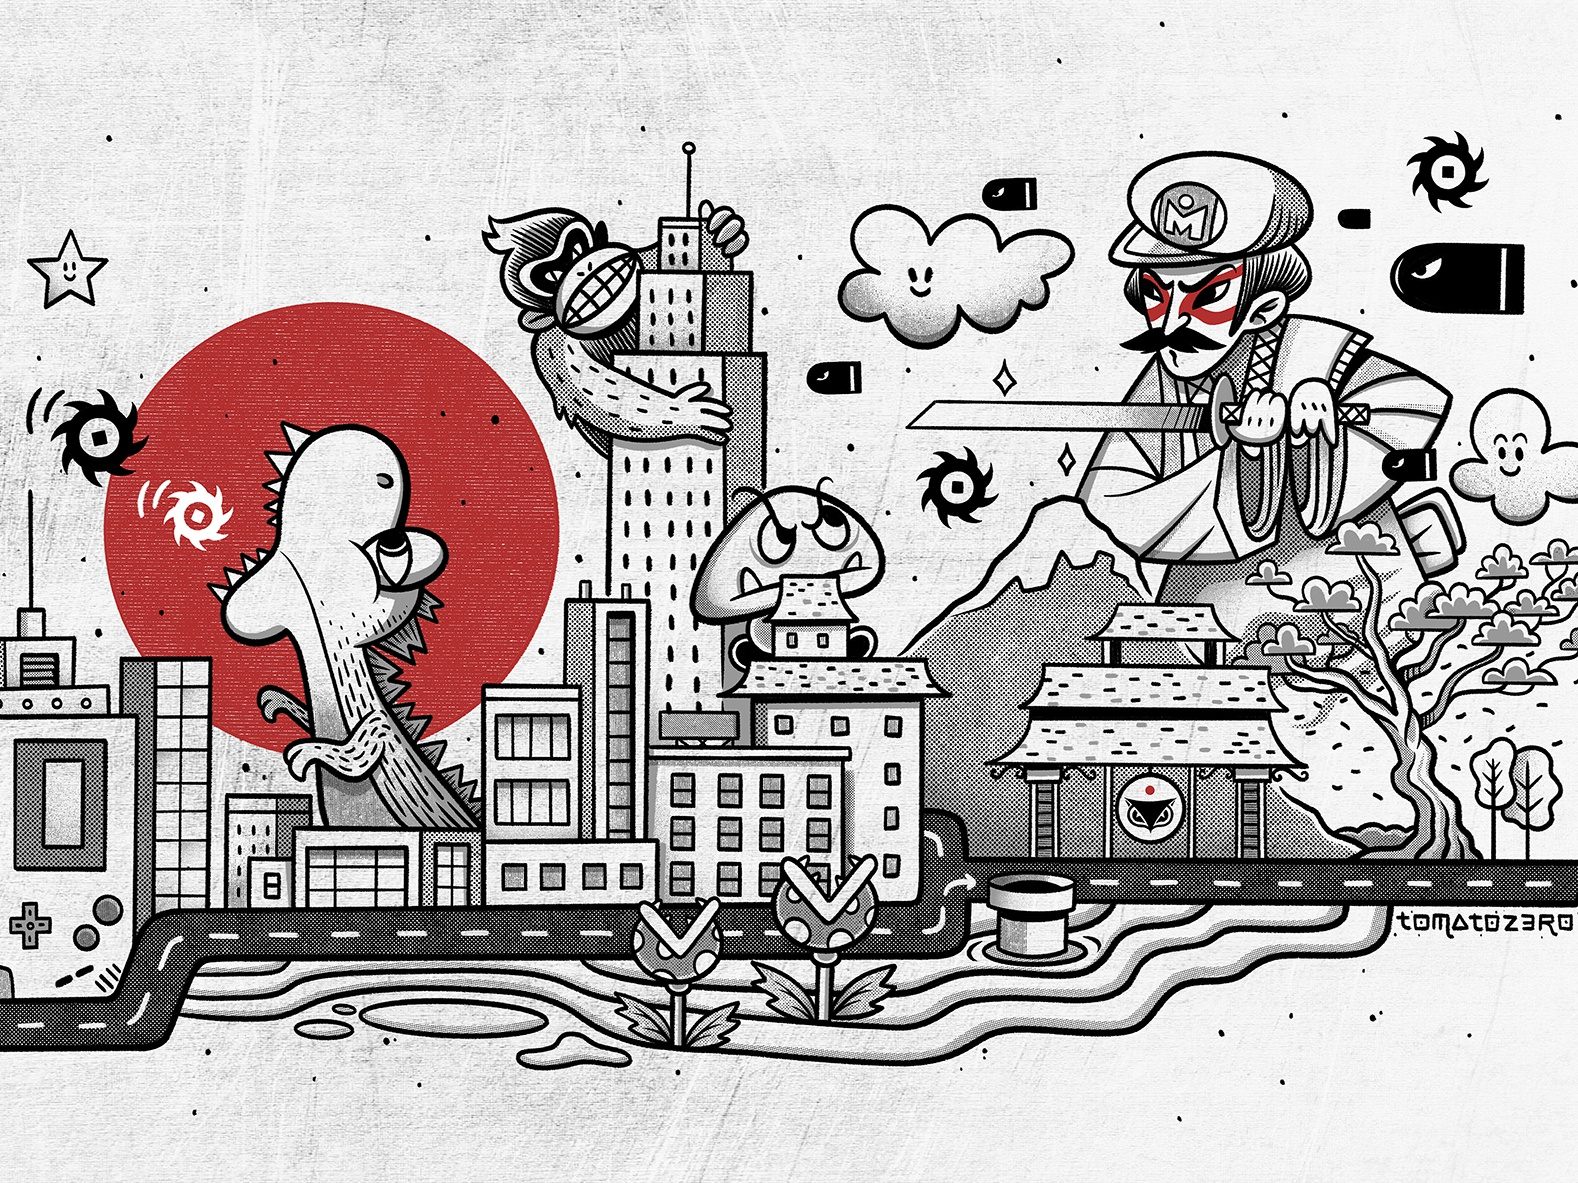 Soc wall preview soc poster